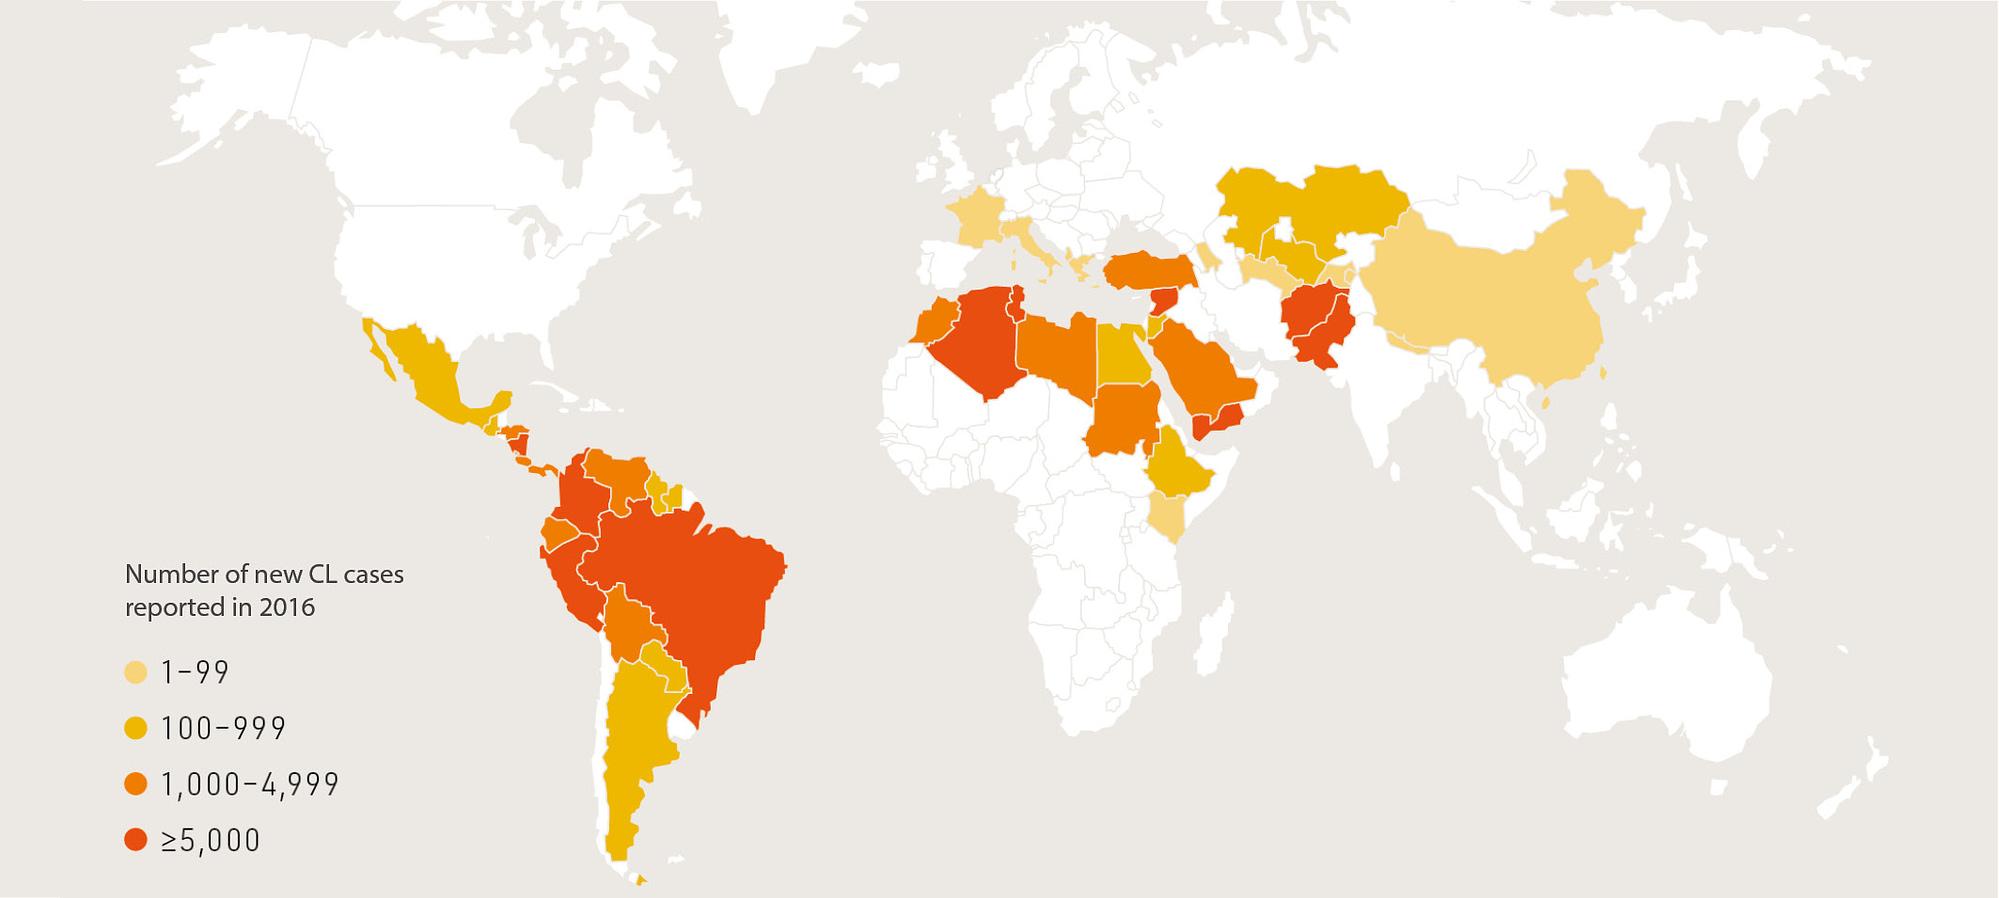 Cutaneous leishmaniasis epidemiology map